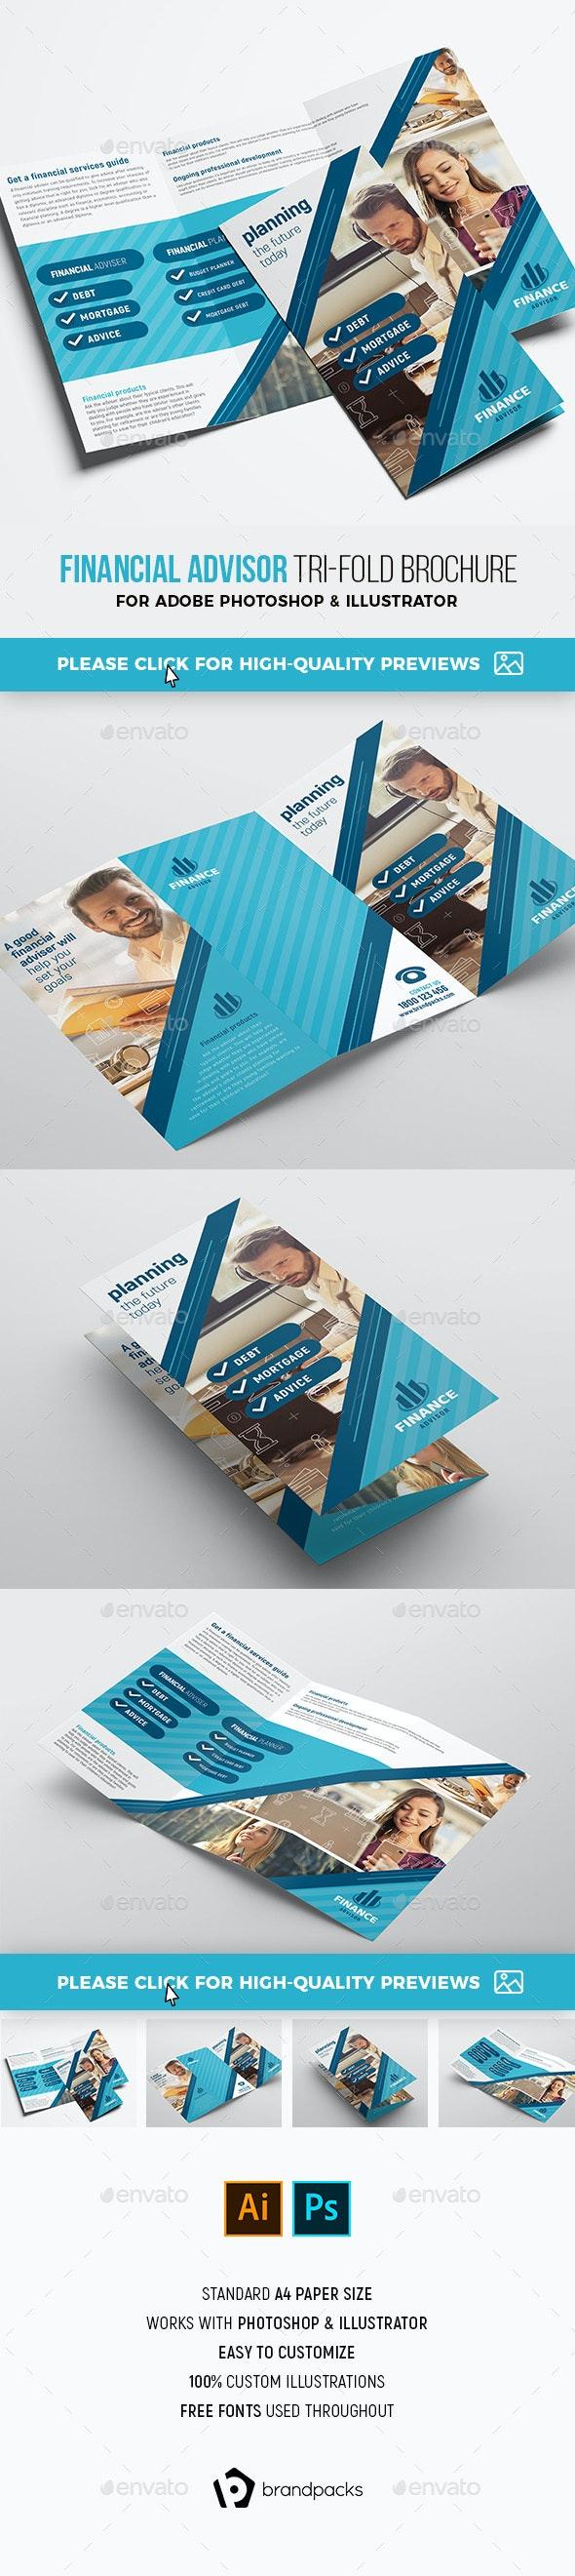 Financial Advisor Trifold Brochure Template - Corporate Brochures